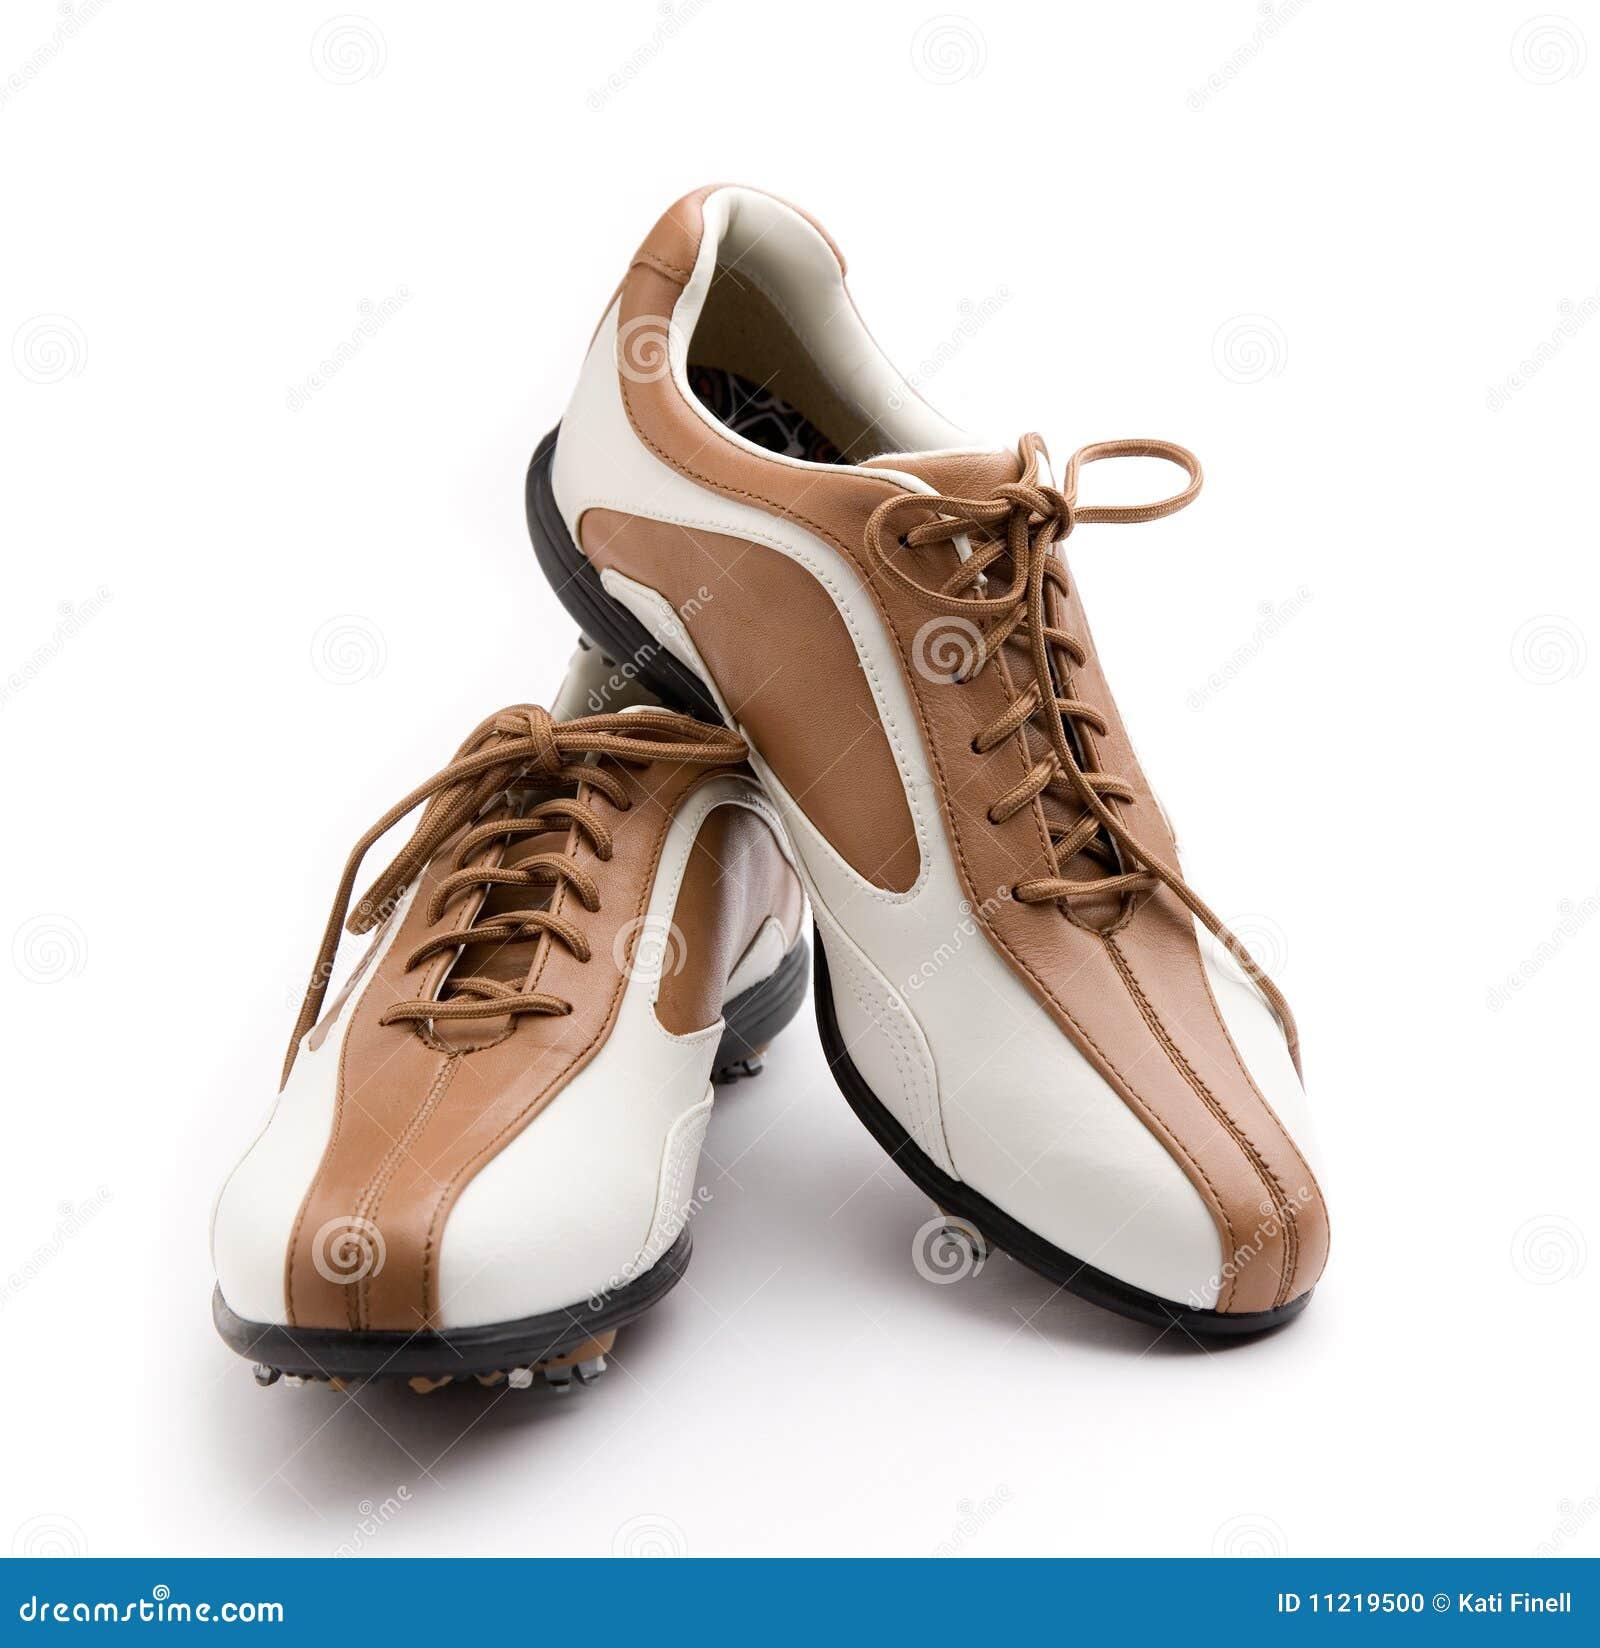 e9672fe4b97 παπούτσια γκολφ στοκ εικόνες. εικόνα από δέρμα, leisure - 11219500